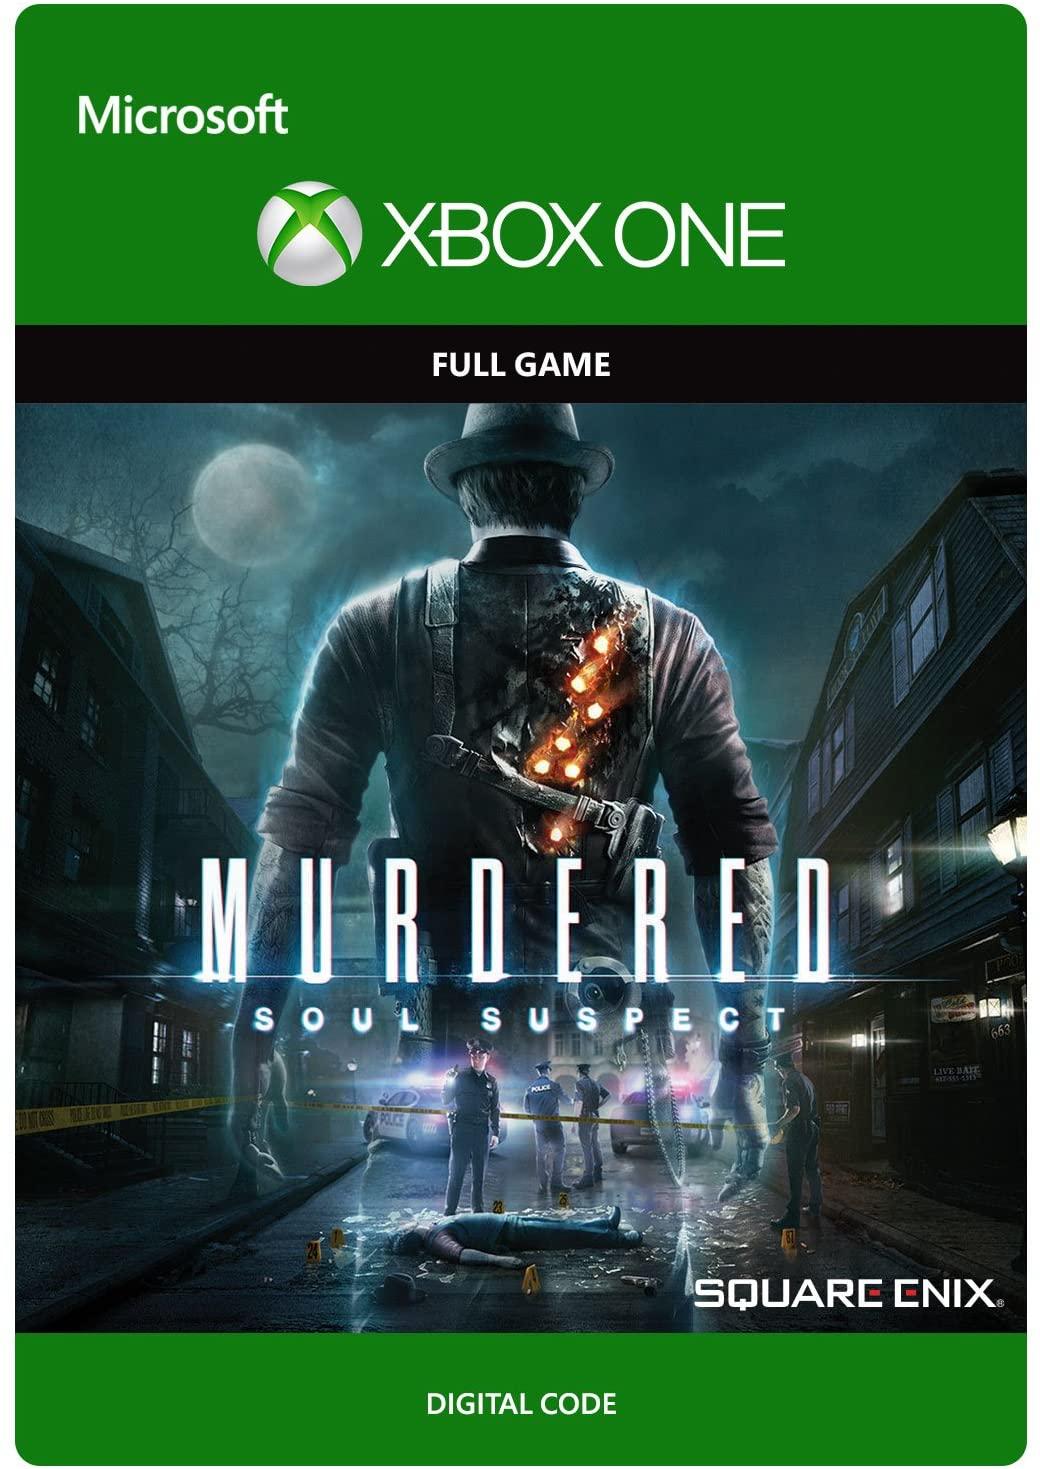 Murdered: Soul Suspect - Xbox One Digital Code. $2.99 @ Amazon